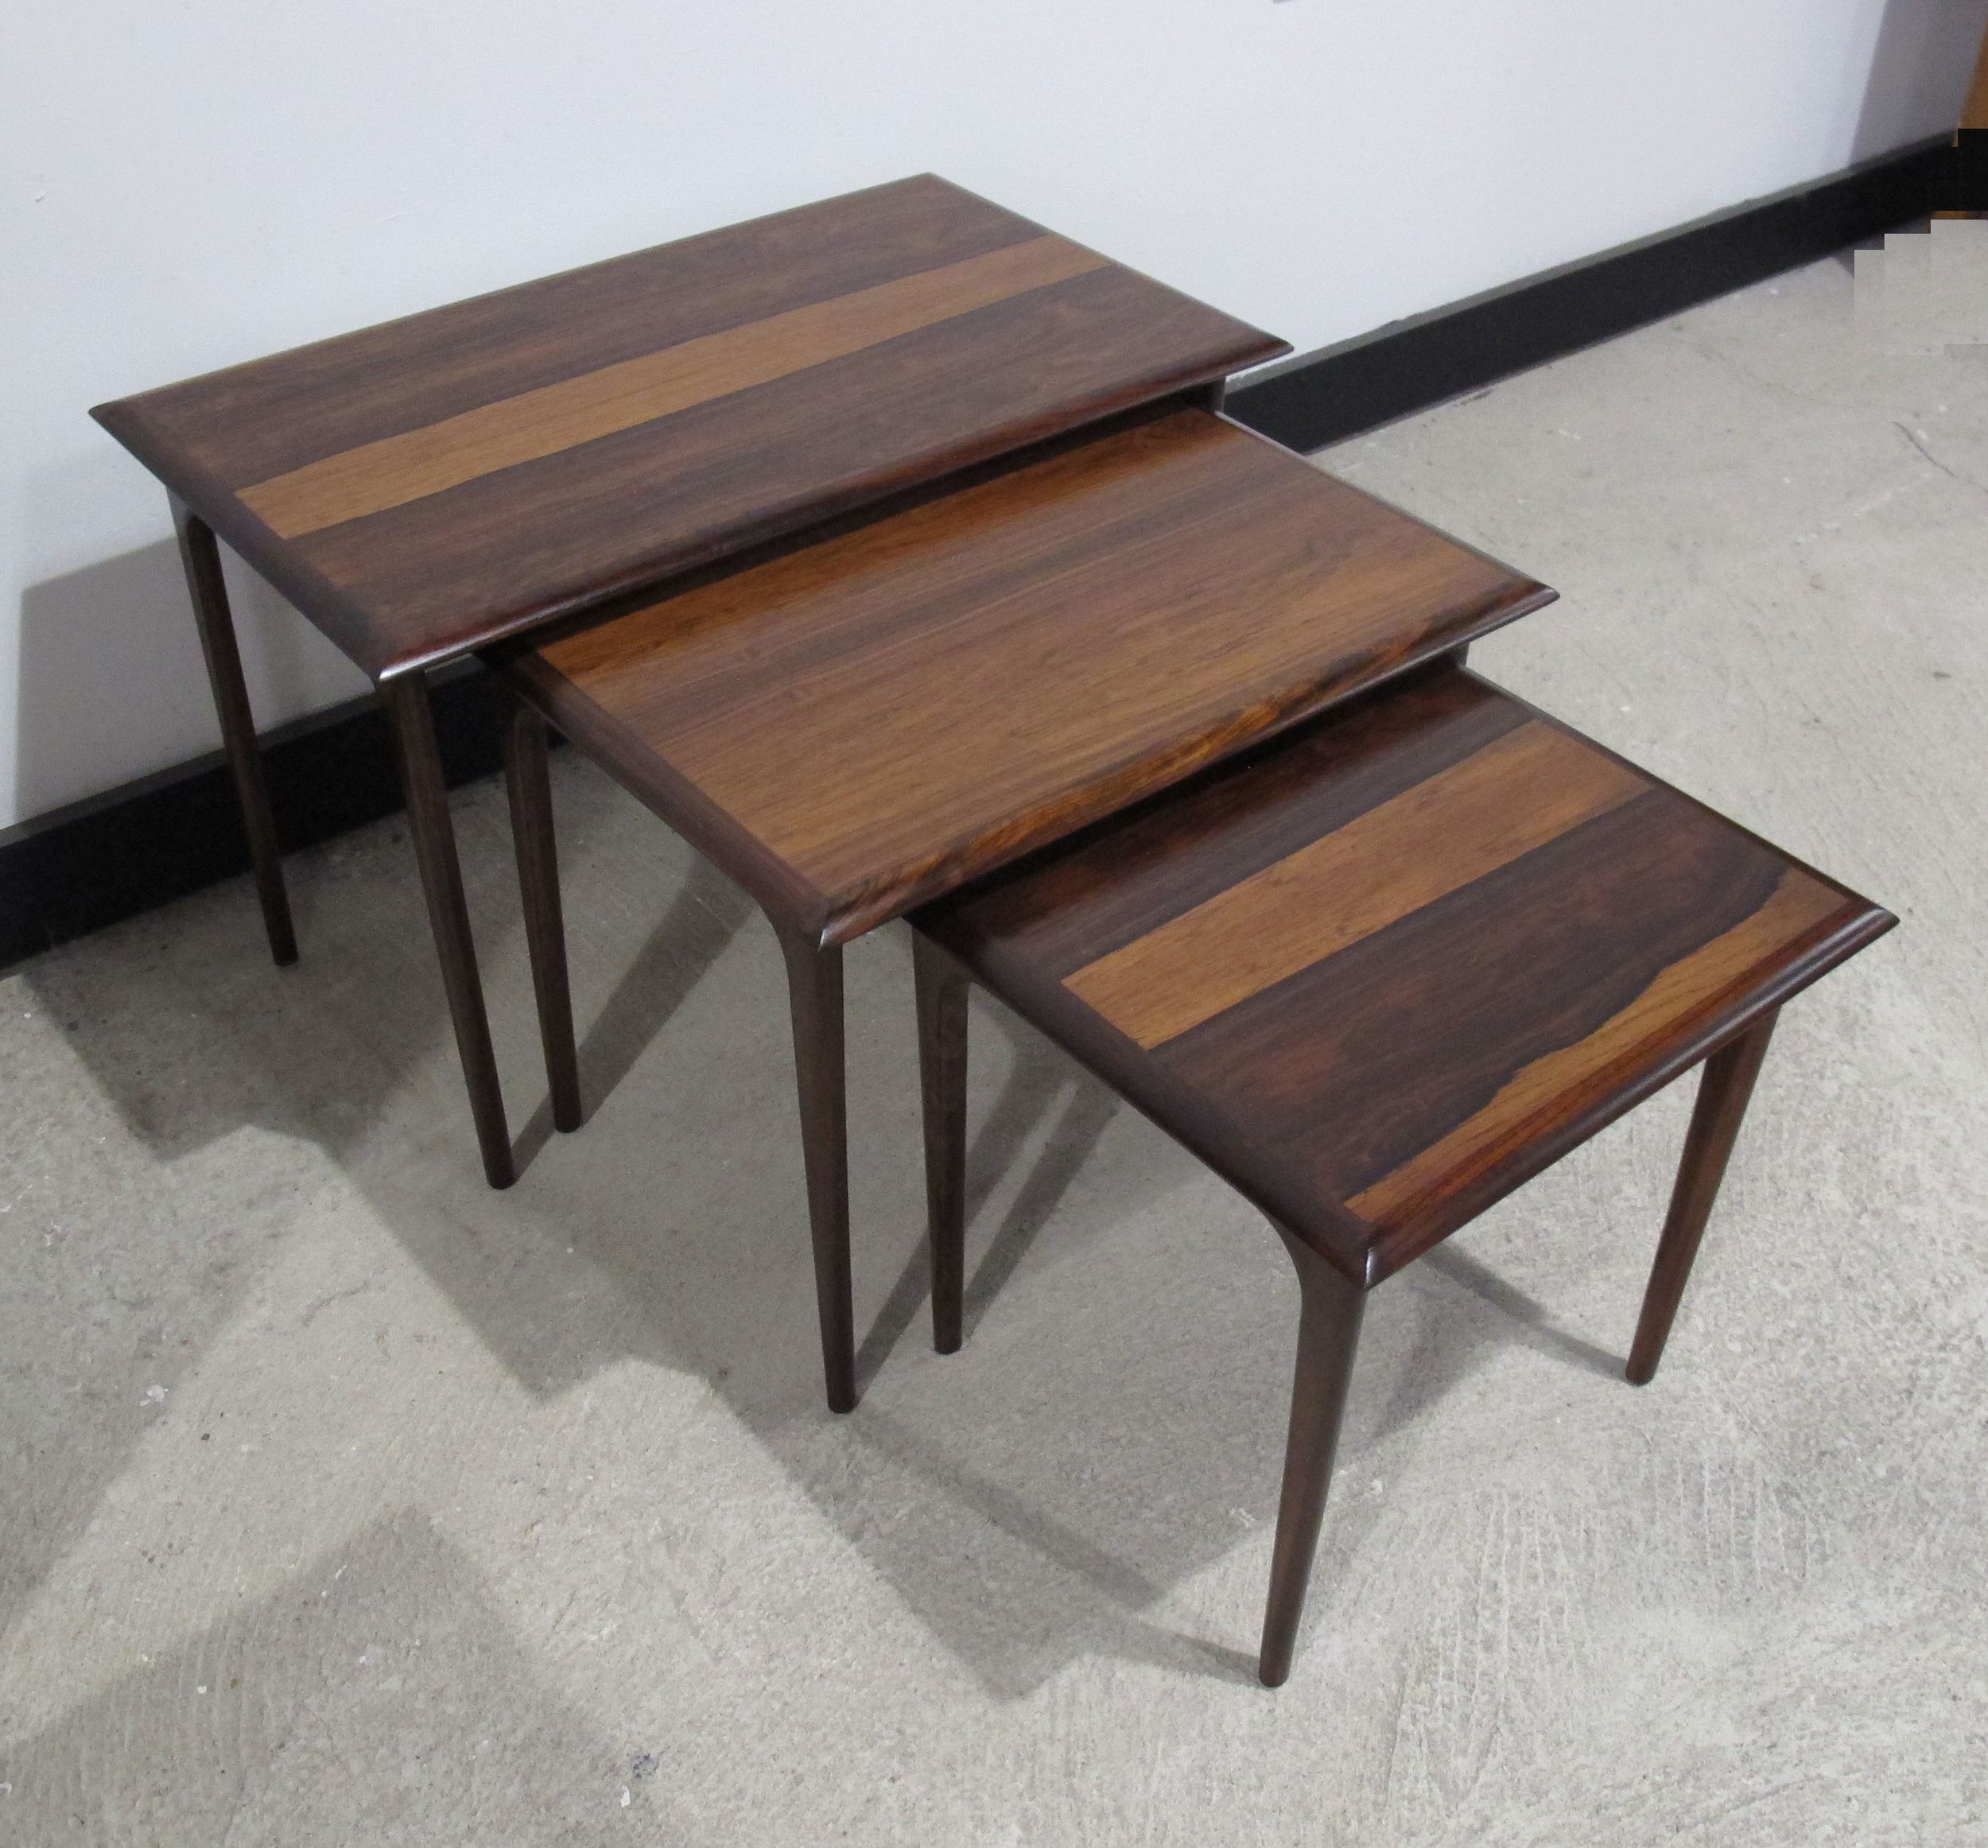 SET OF DANISH MODERN ROSEWOOD NESTING TABLES